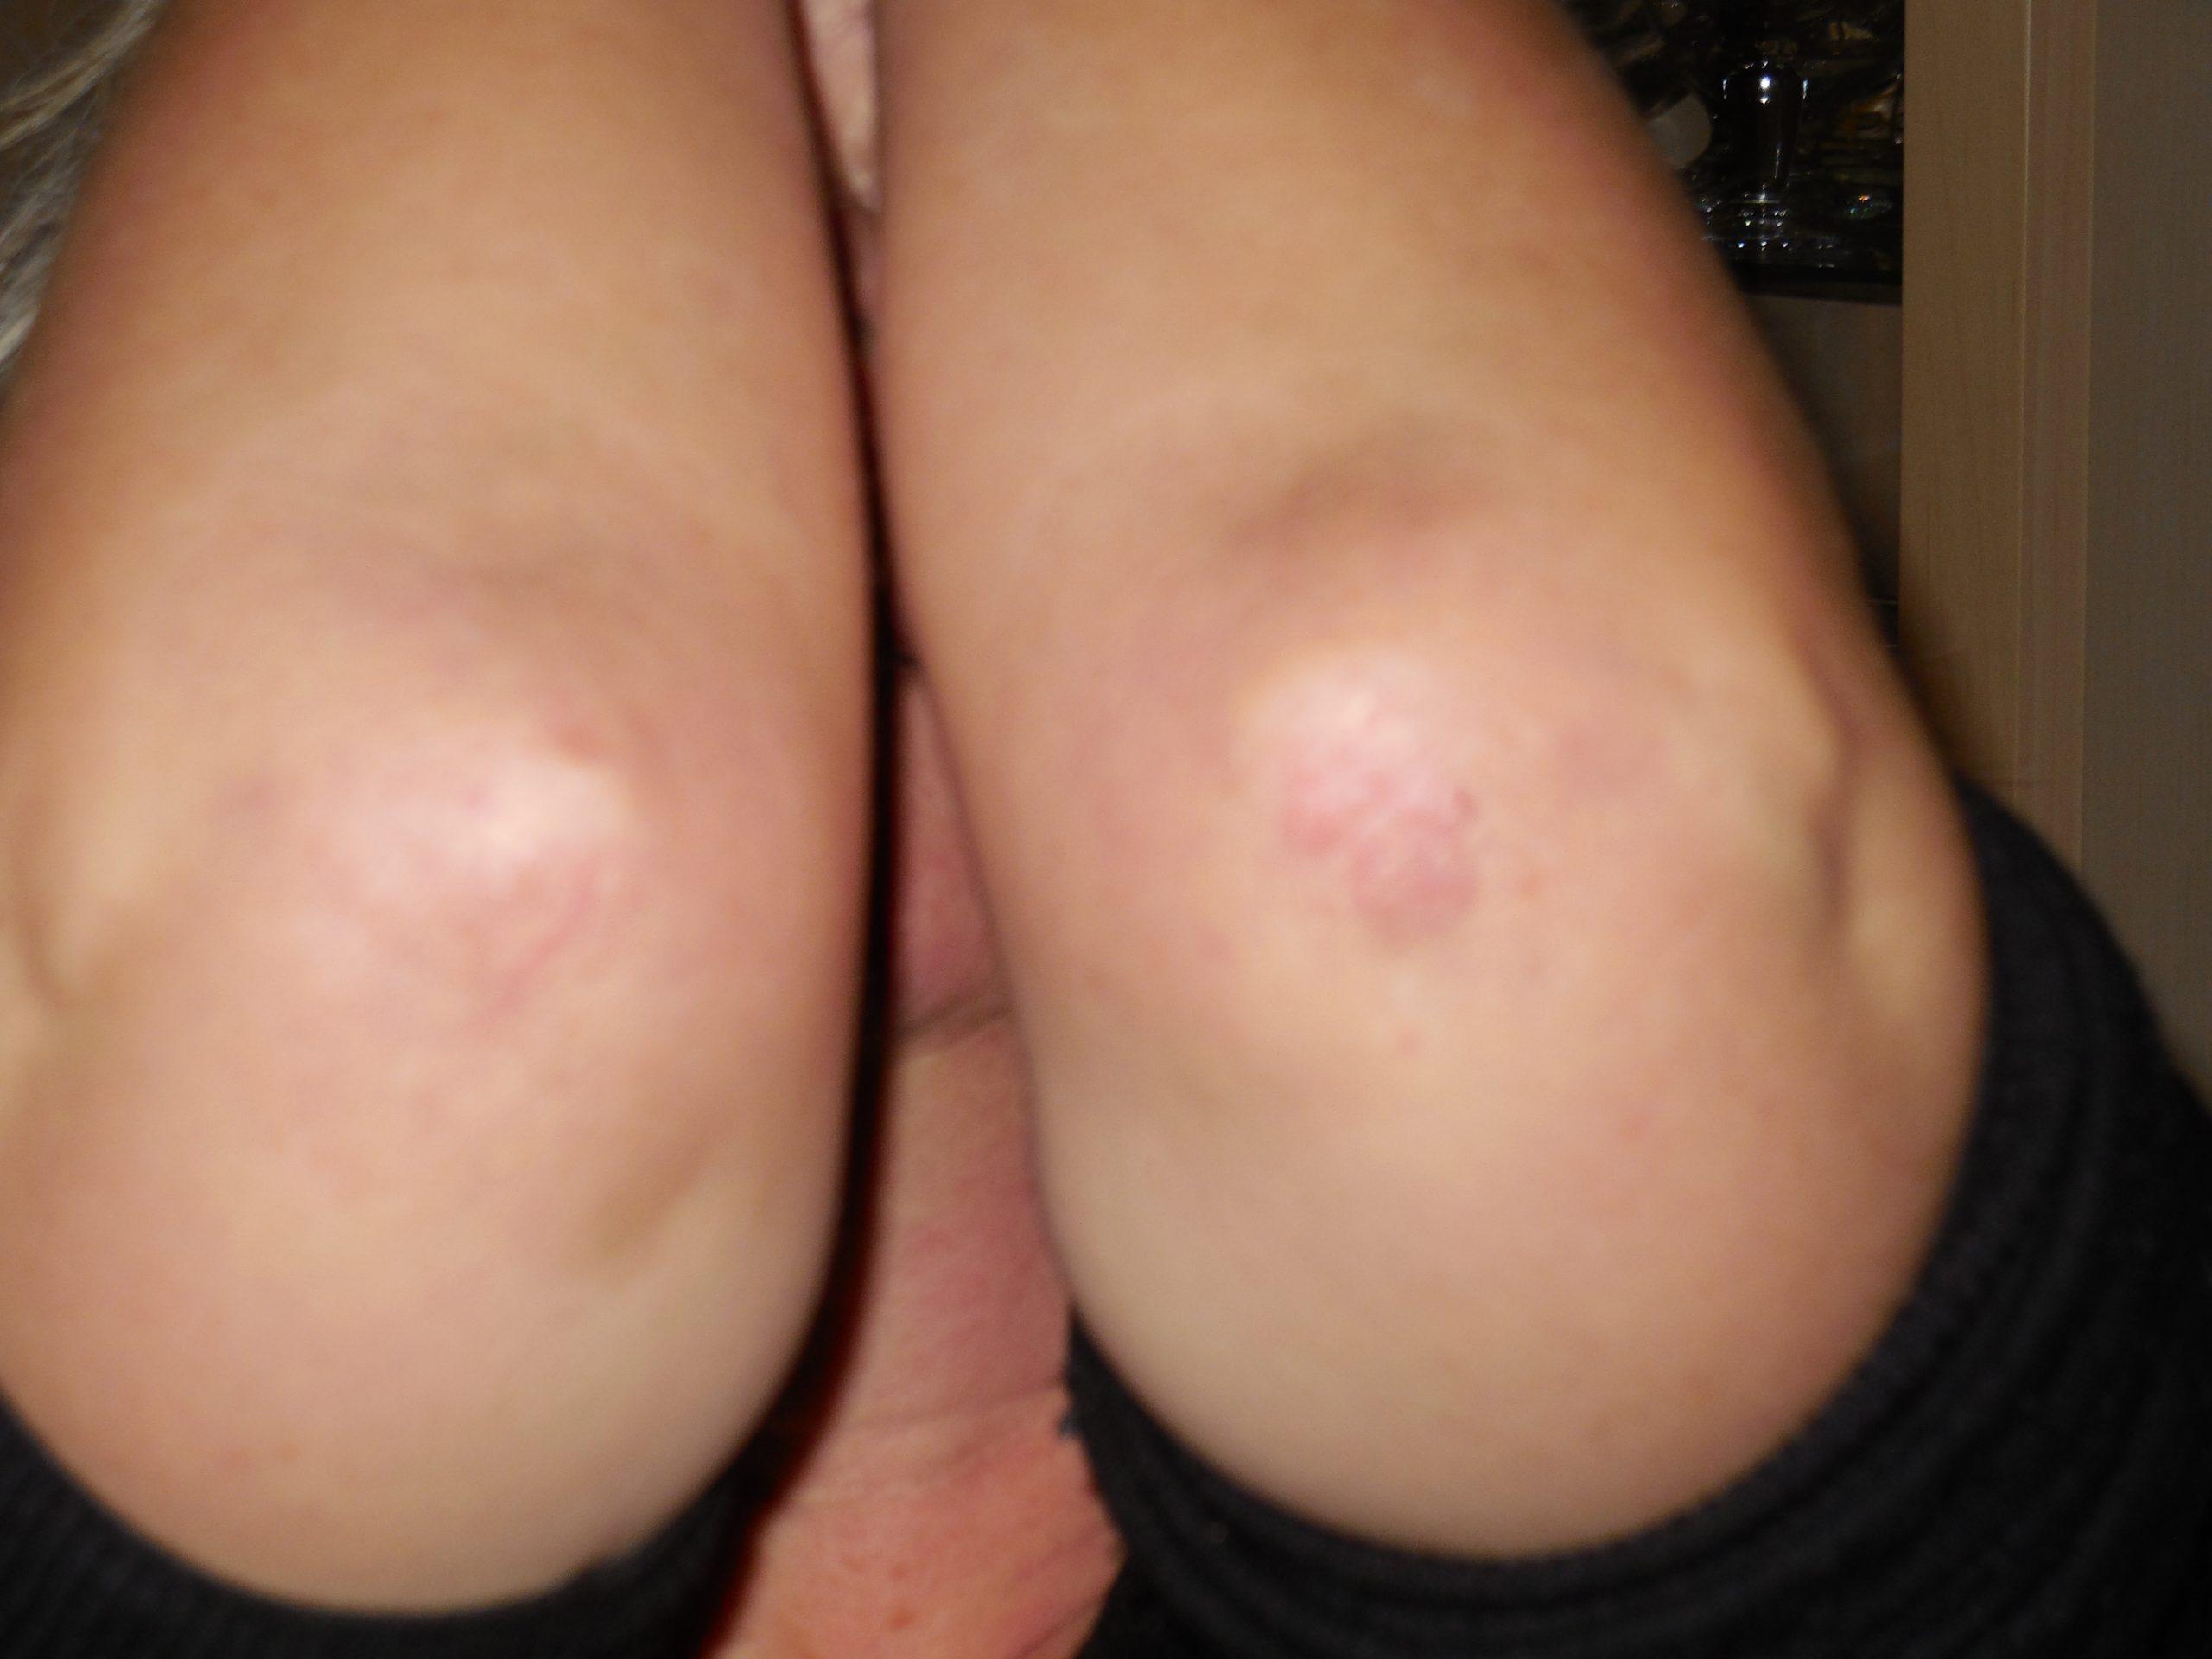 Woman's Skin after having Psoriasis